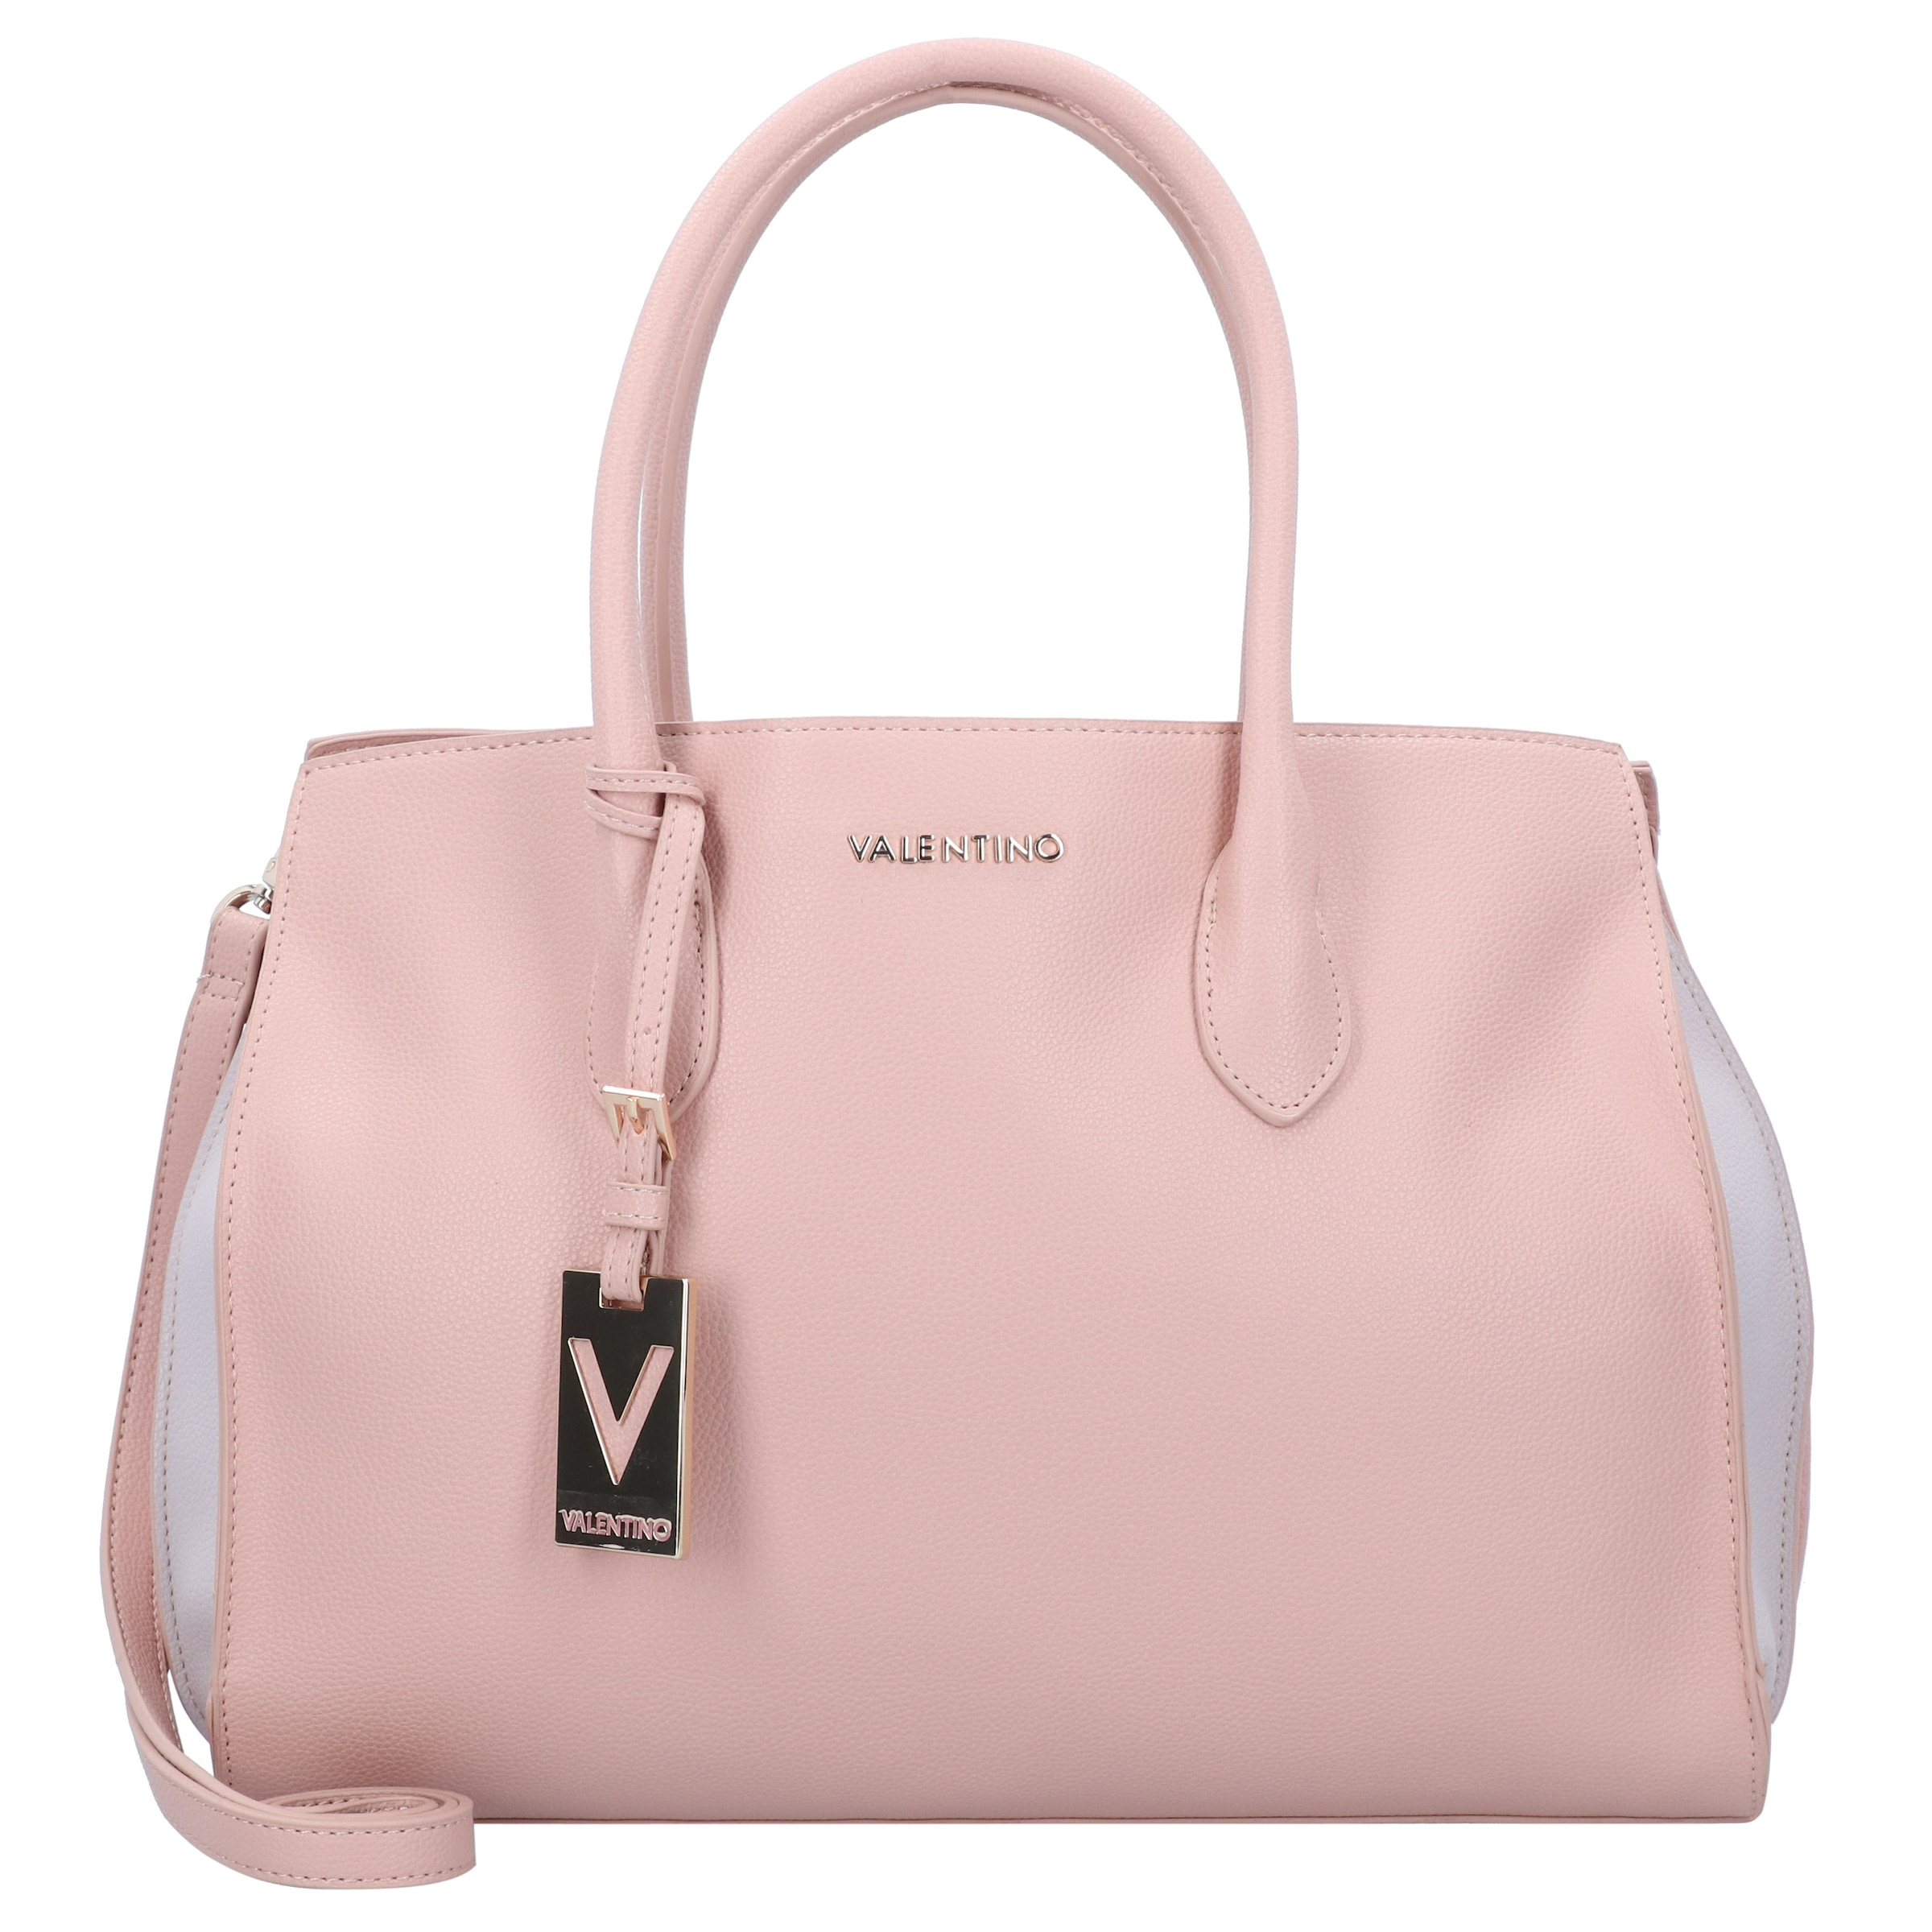 Handtas Valentino 'summer Pitaja In Handbags Memento' RozePastelroze Wit qjzMVLSUpG